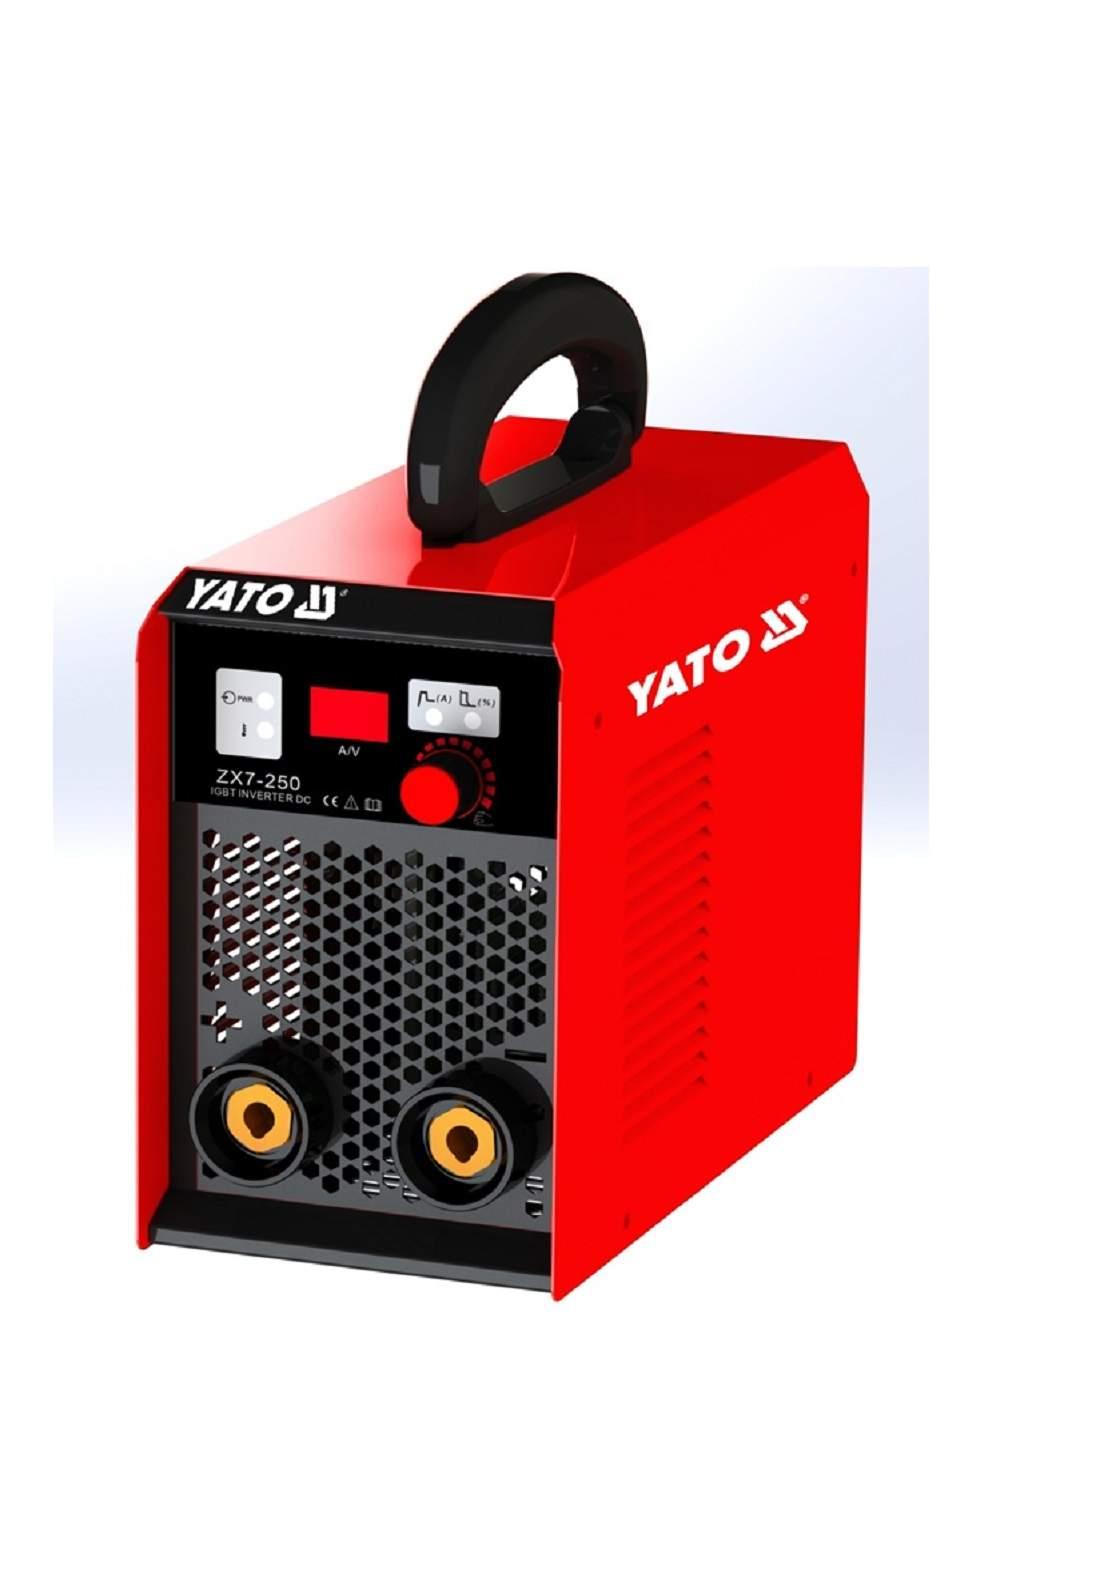 Yato YT-81330 Mini welding machine 160A ماكنة لحام